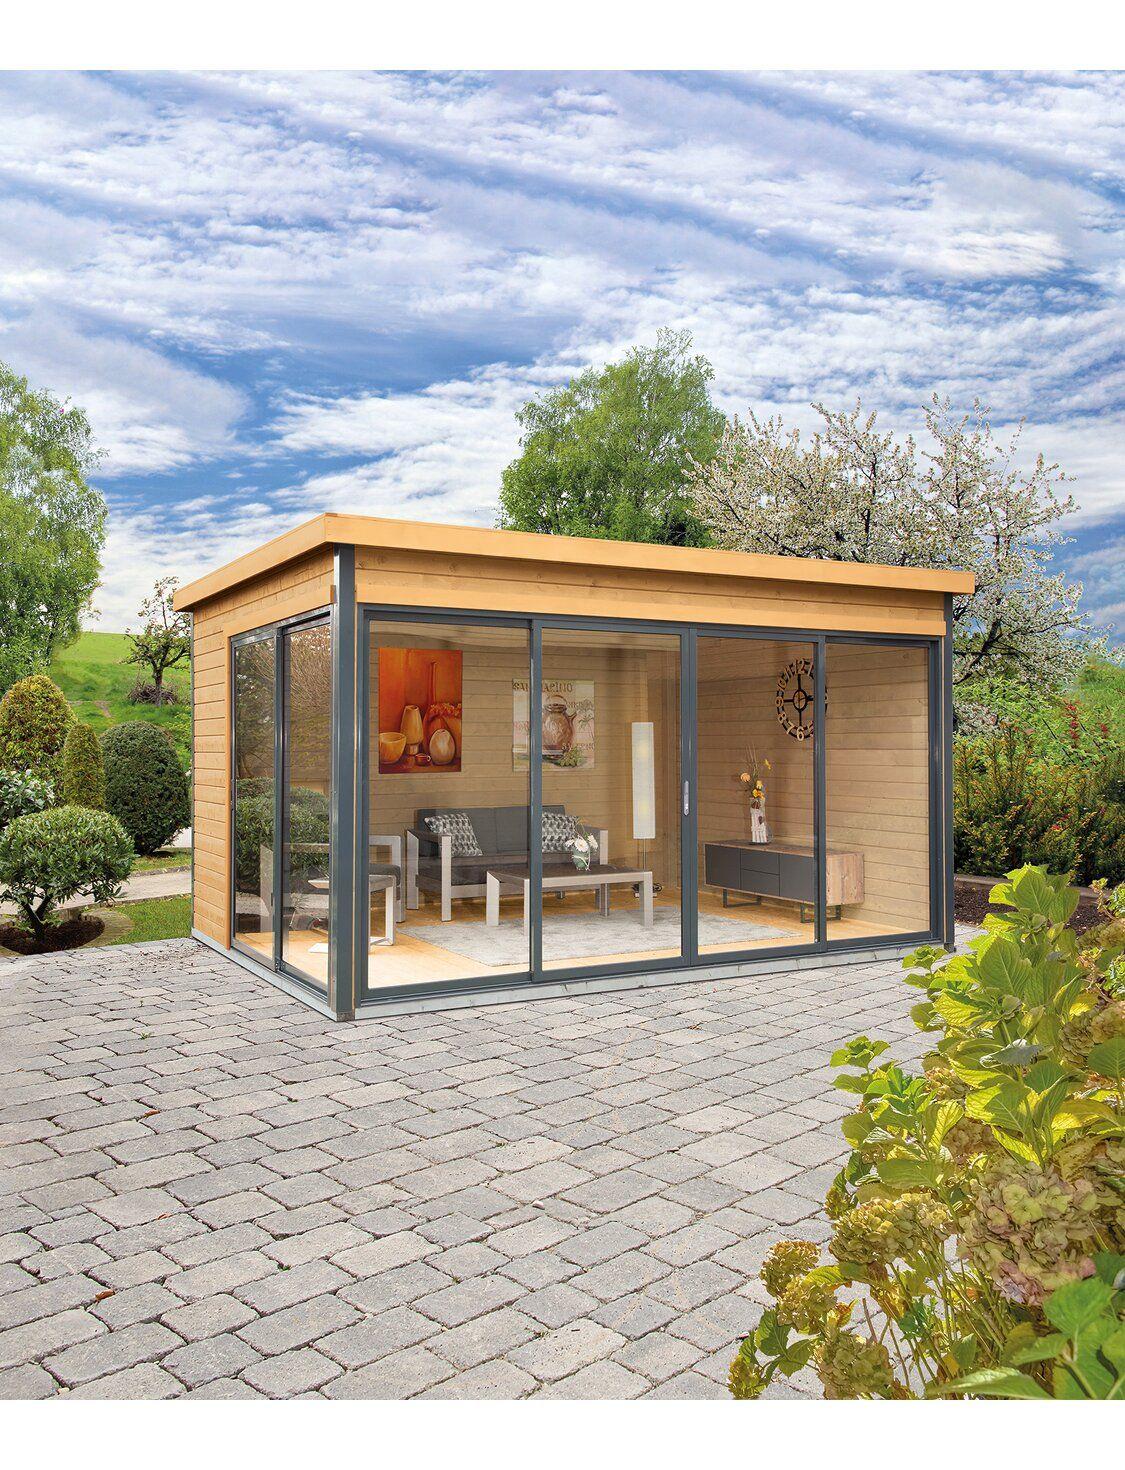 Wolff Finnhaus Holz Gartenhaus Studio 44 D Unbehandelt Bxt 438 Cm X 342 Cm Kaufen Bei Obi Gartenhaus Haus Studio